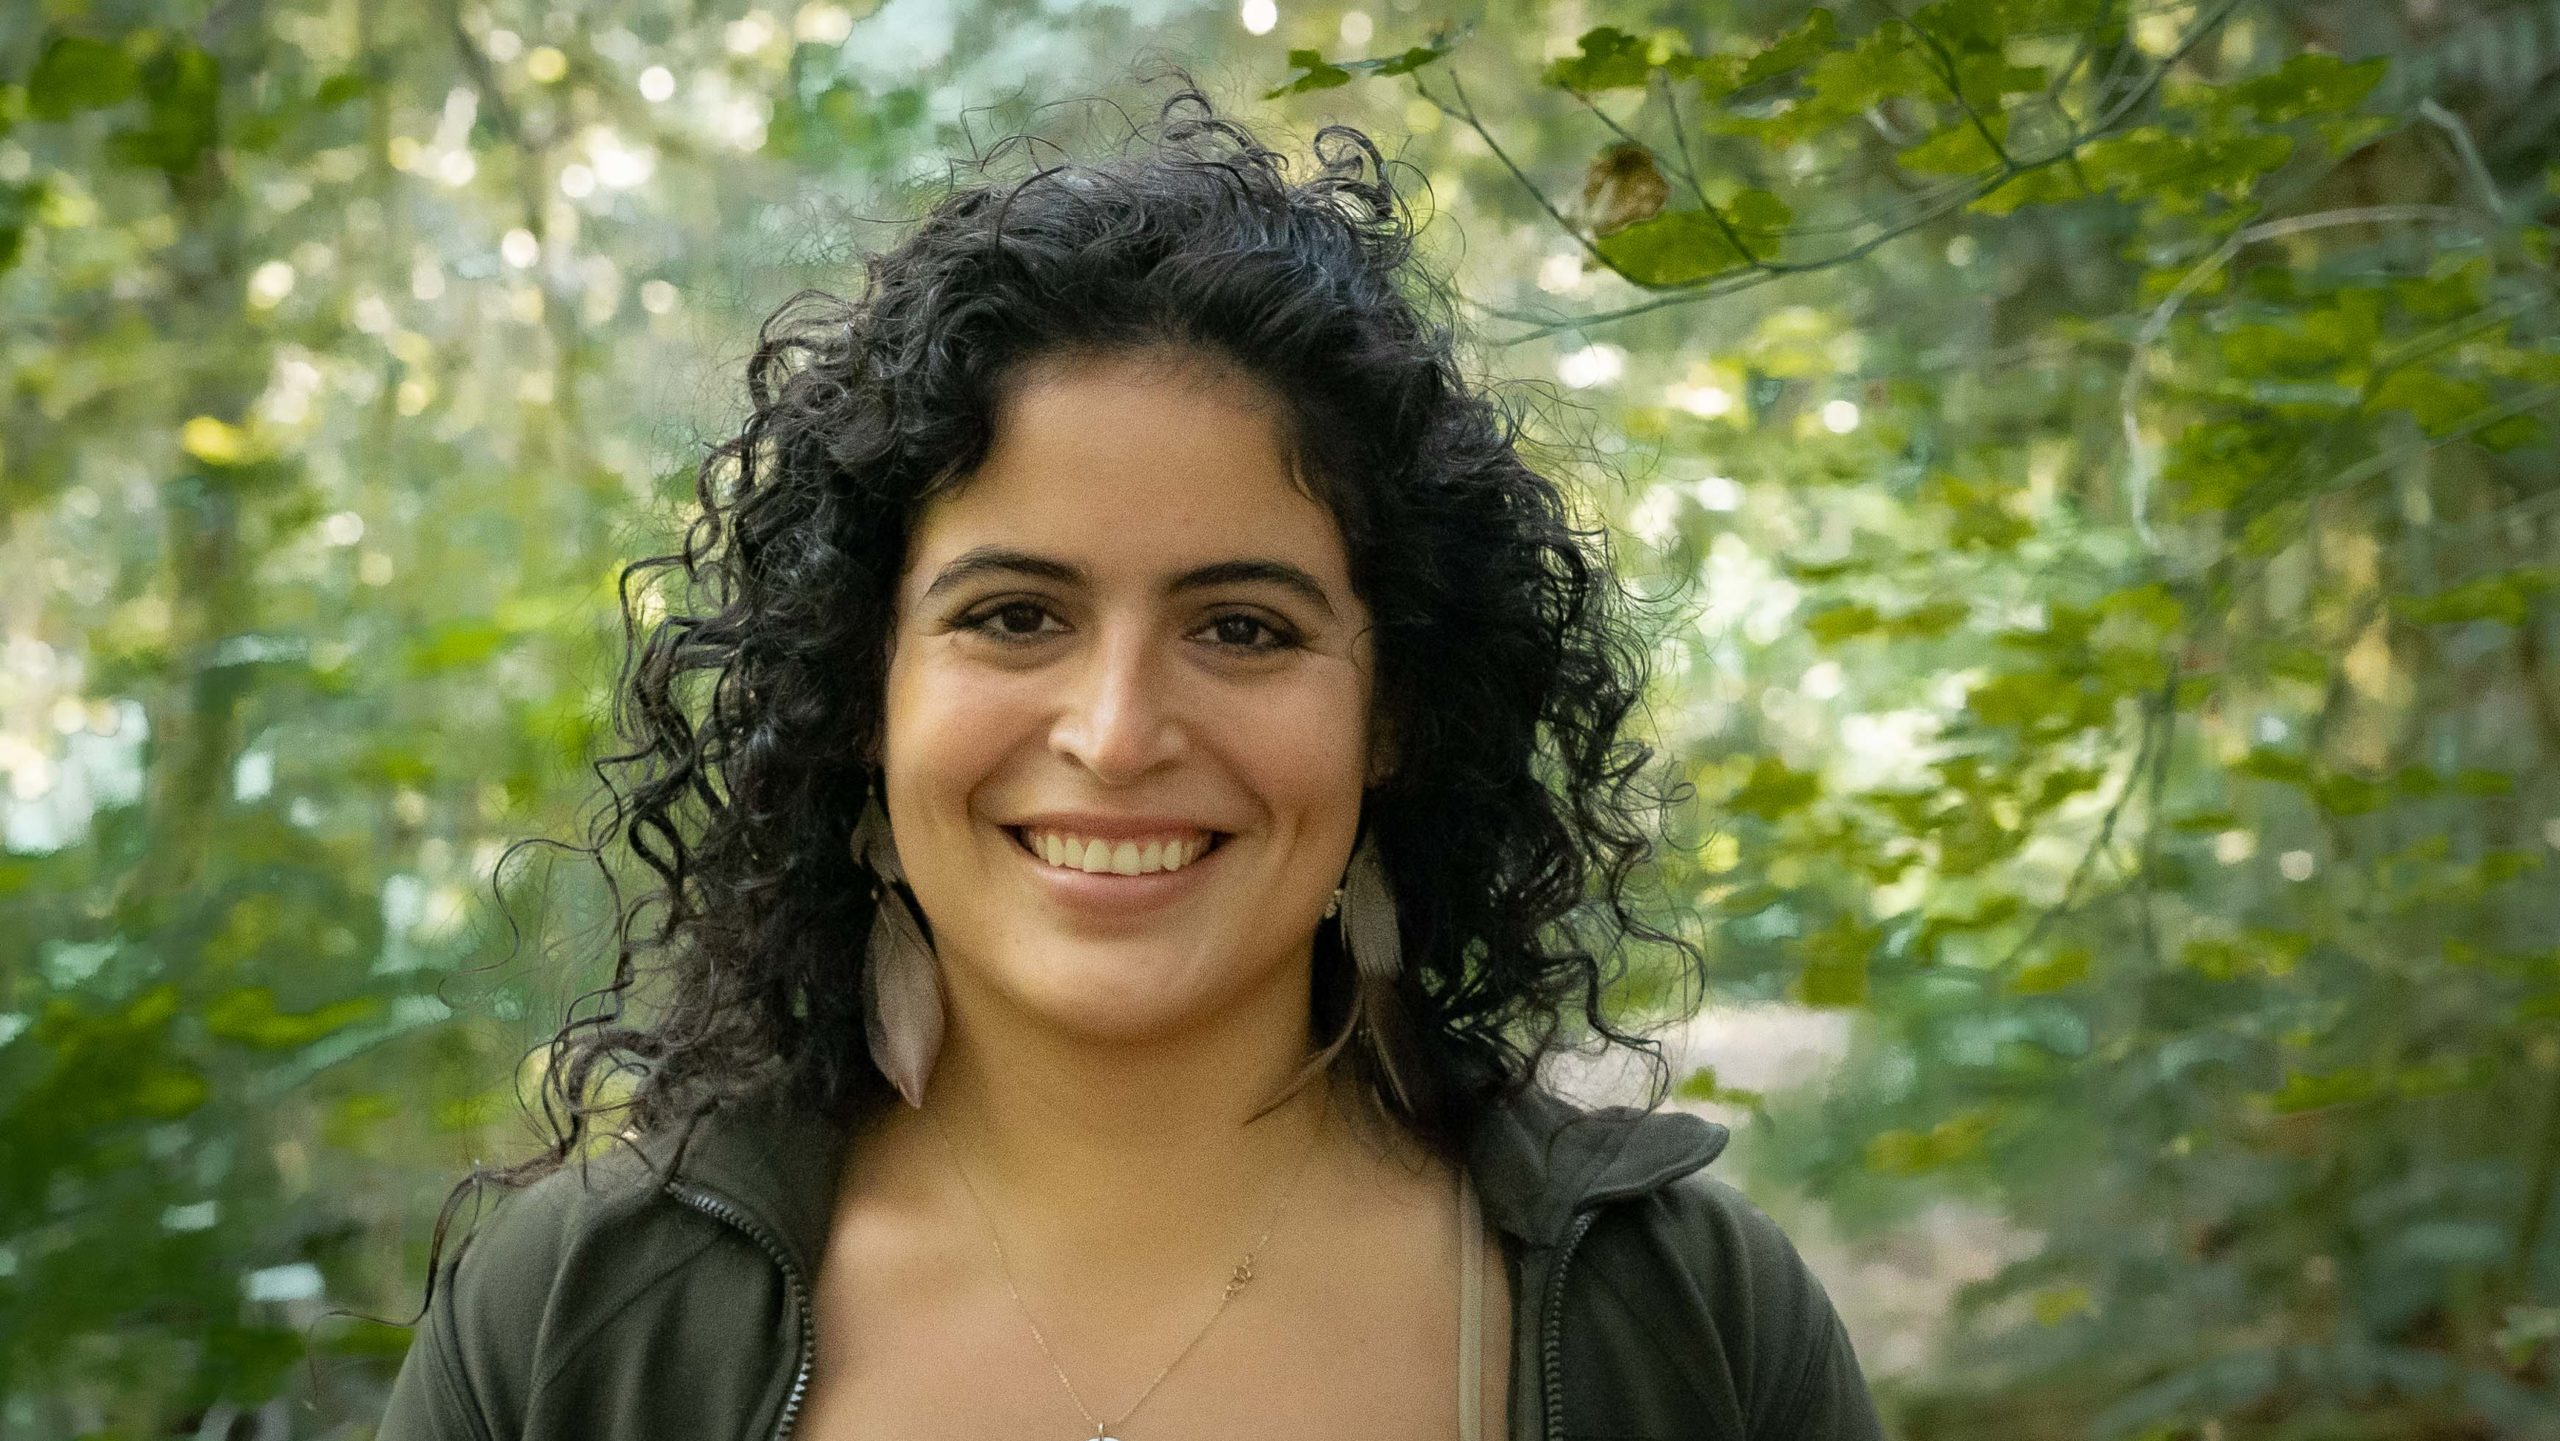 Marina Rivera-Dominguez